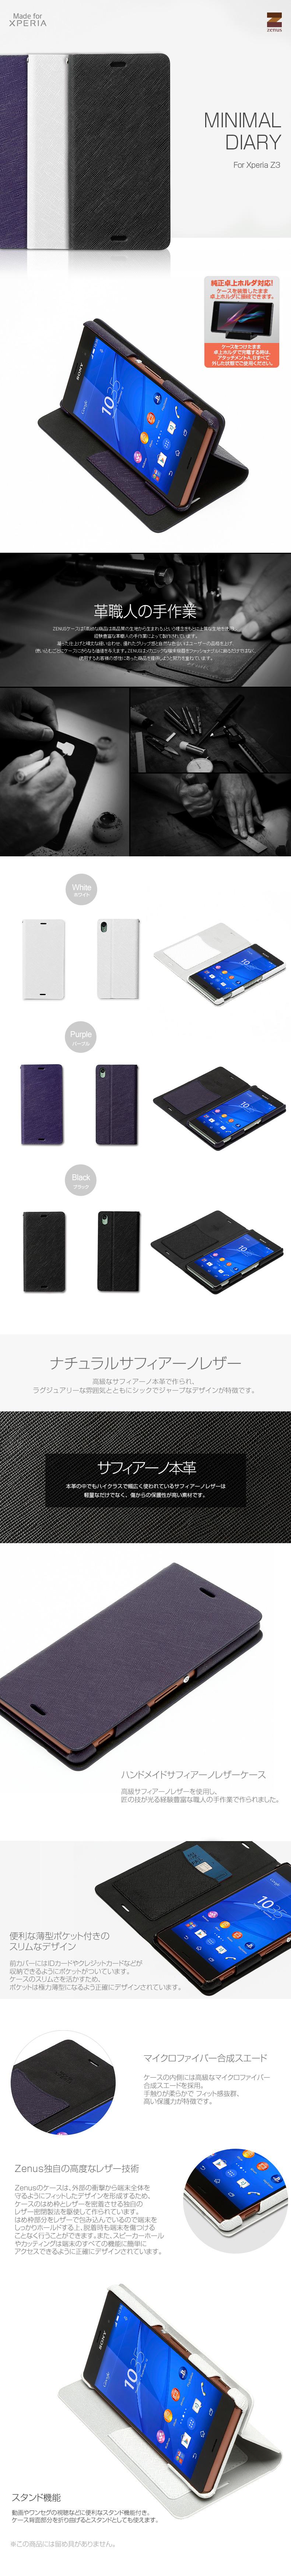 商品詳細-docomo Xperia Z3 SO-01G,au Xperia Z3 SOL26専用ケース